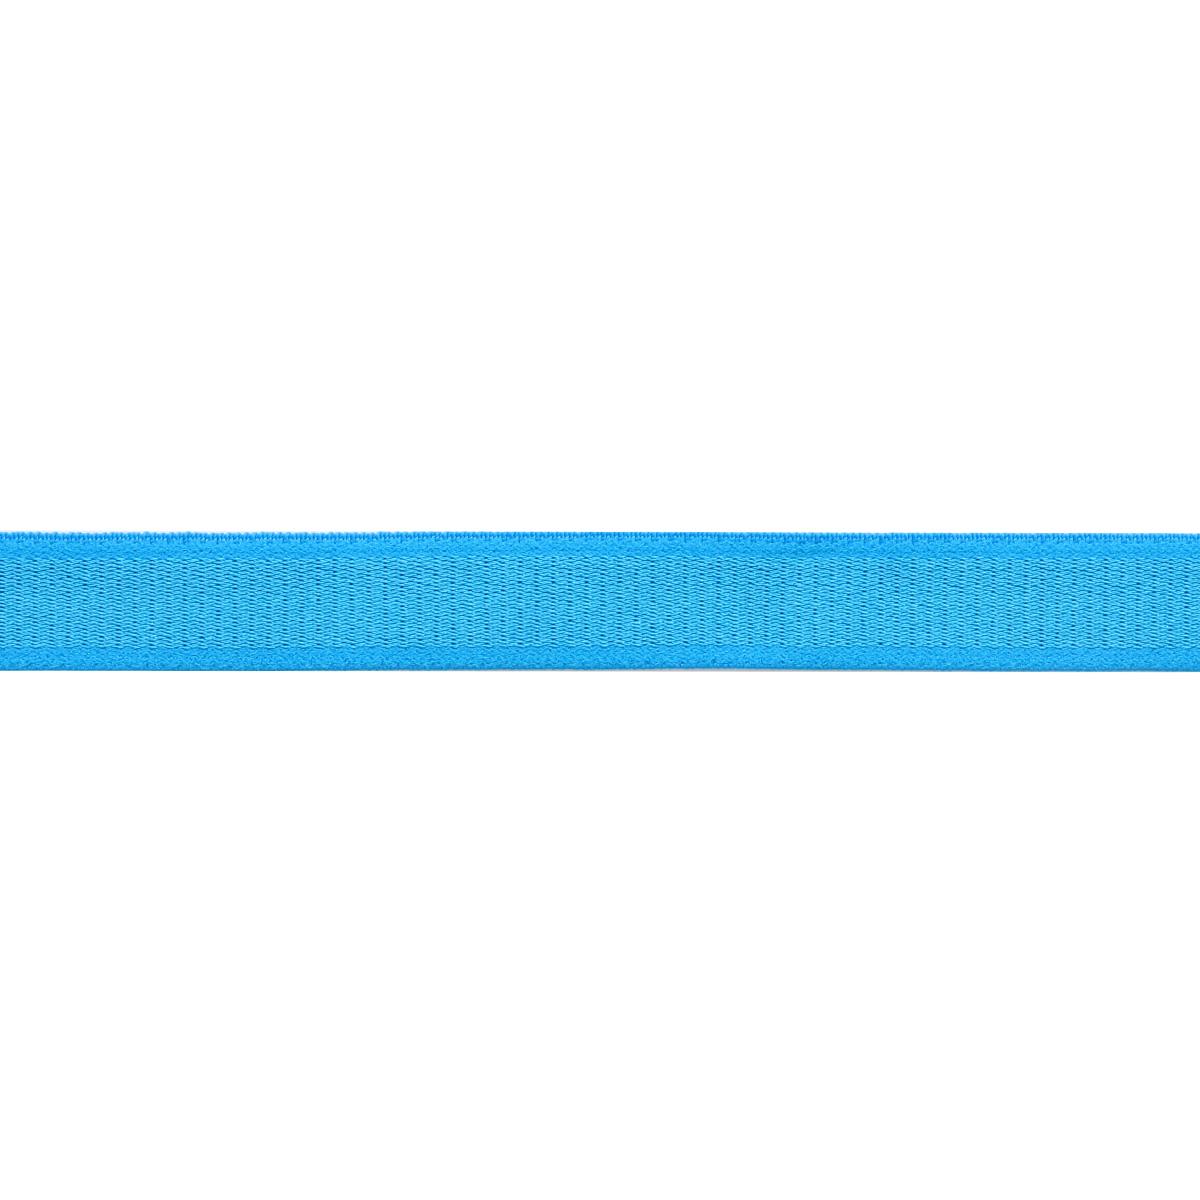 1112 Лента эластичная для бретелей 1,2см*50м